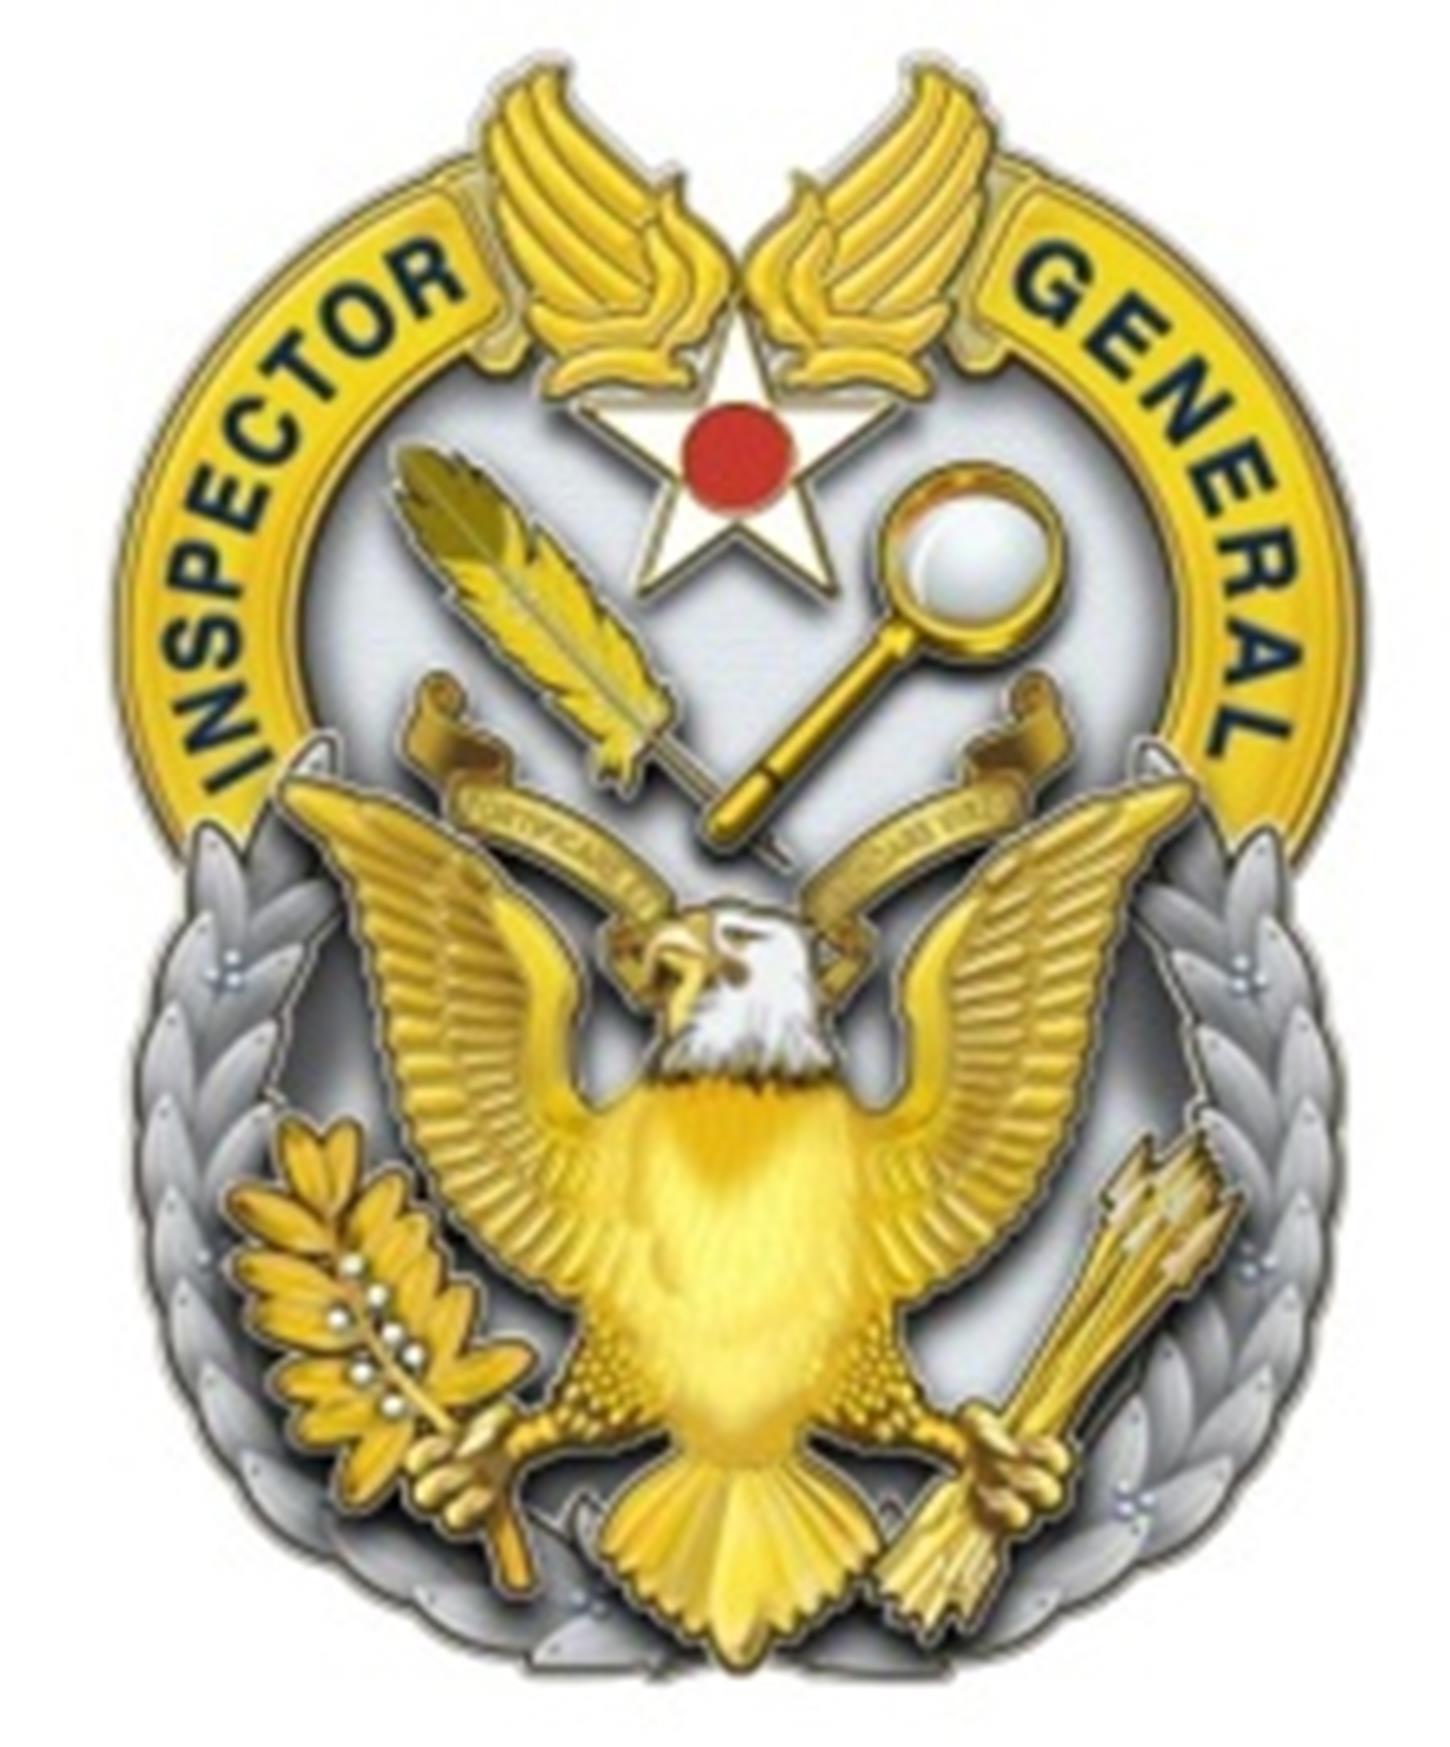 holloman air force base units inspector general